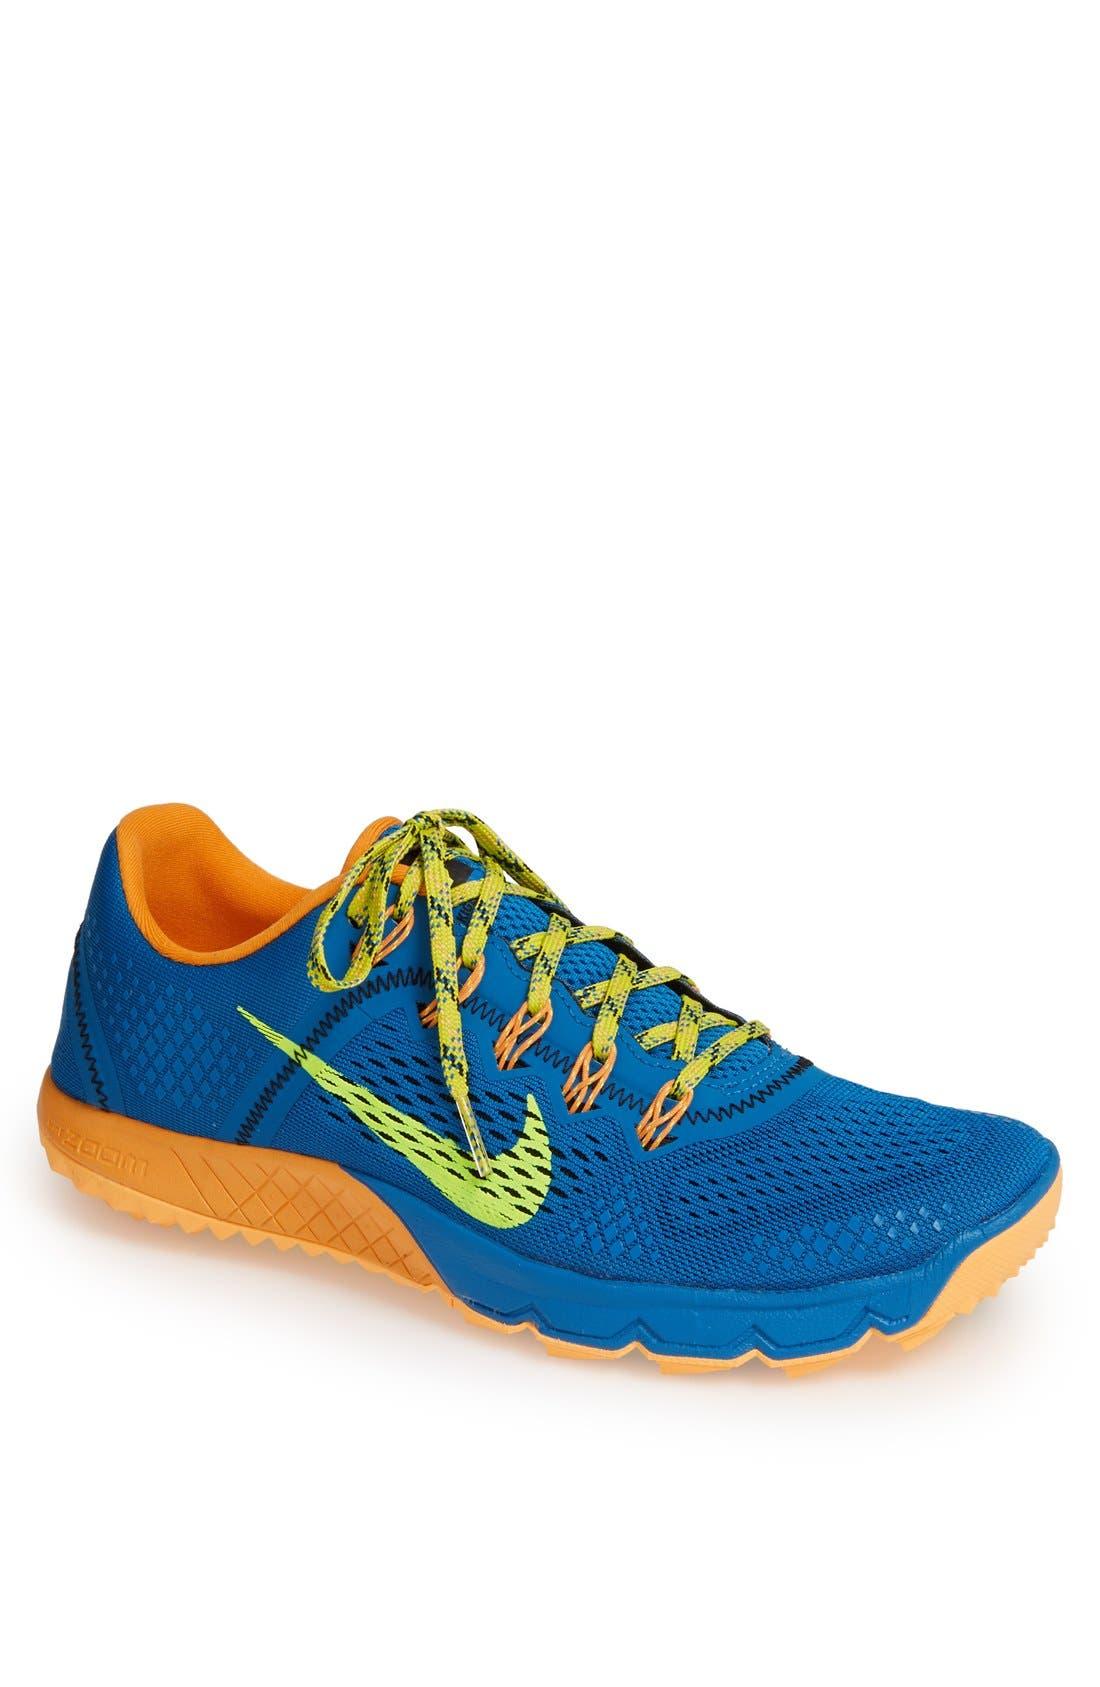 Main Image - Nike 'Zoom Terra Kiger' Trail Running Shoe (Men)